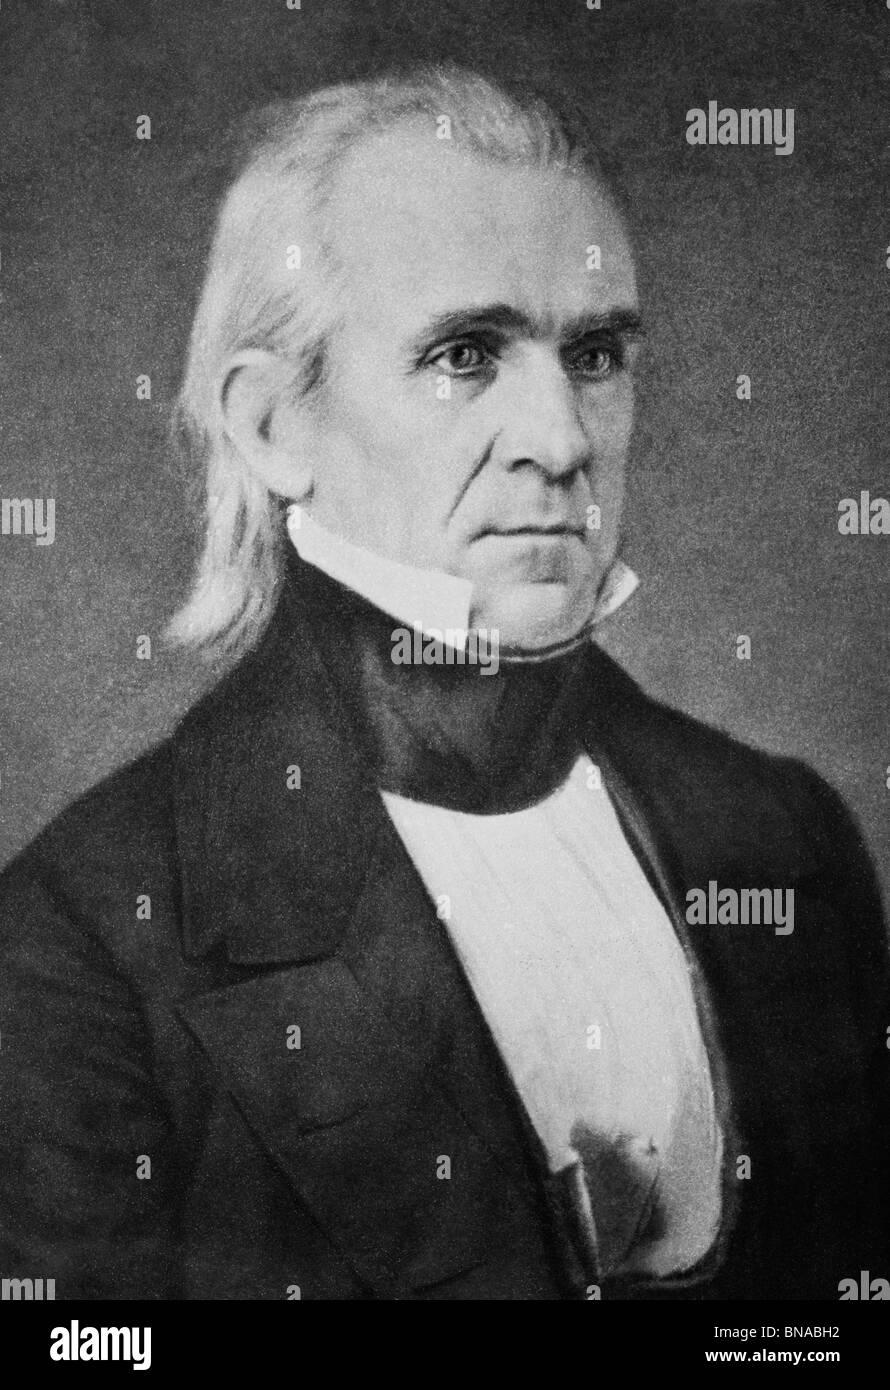 Daguerreotype portrait photo circa 1840s of James K Polk (1795 - 1849) - the 11th US President (1845 - 1849). - Stock Image